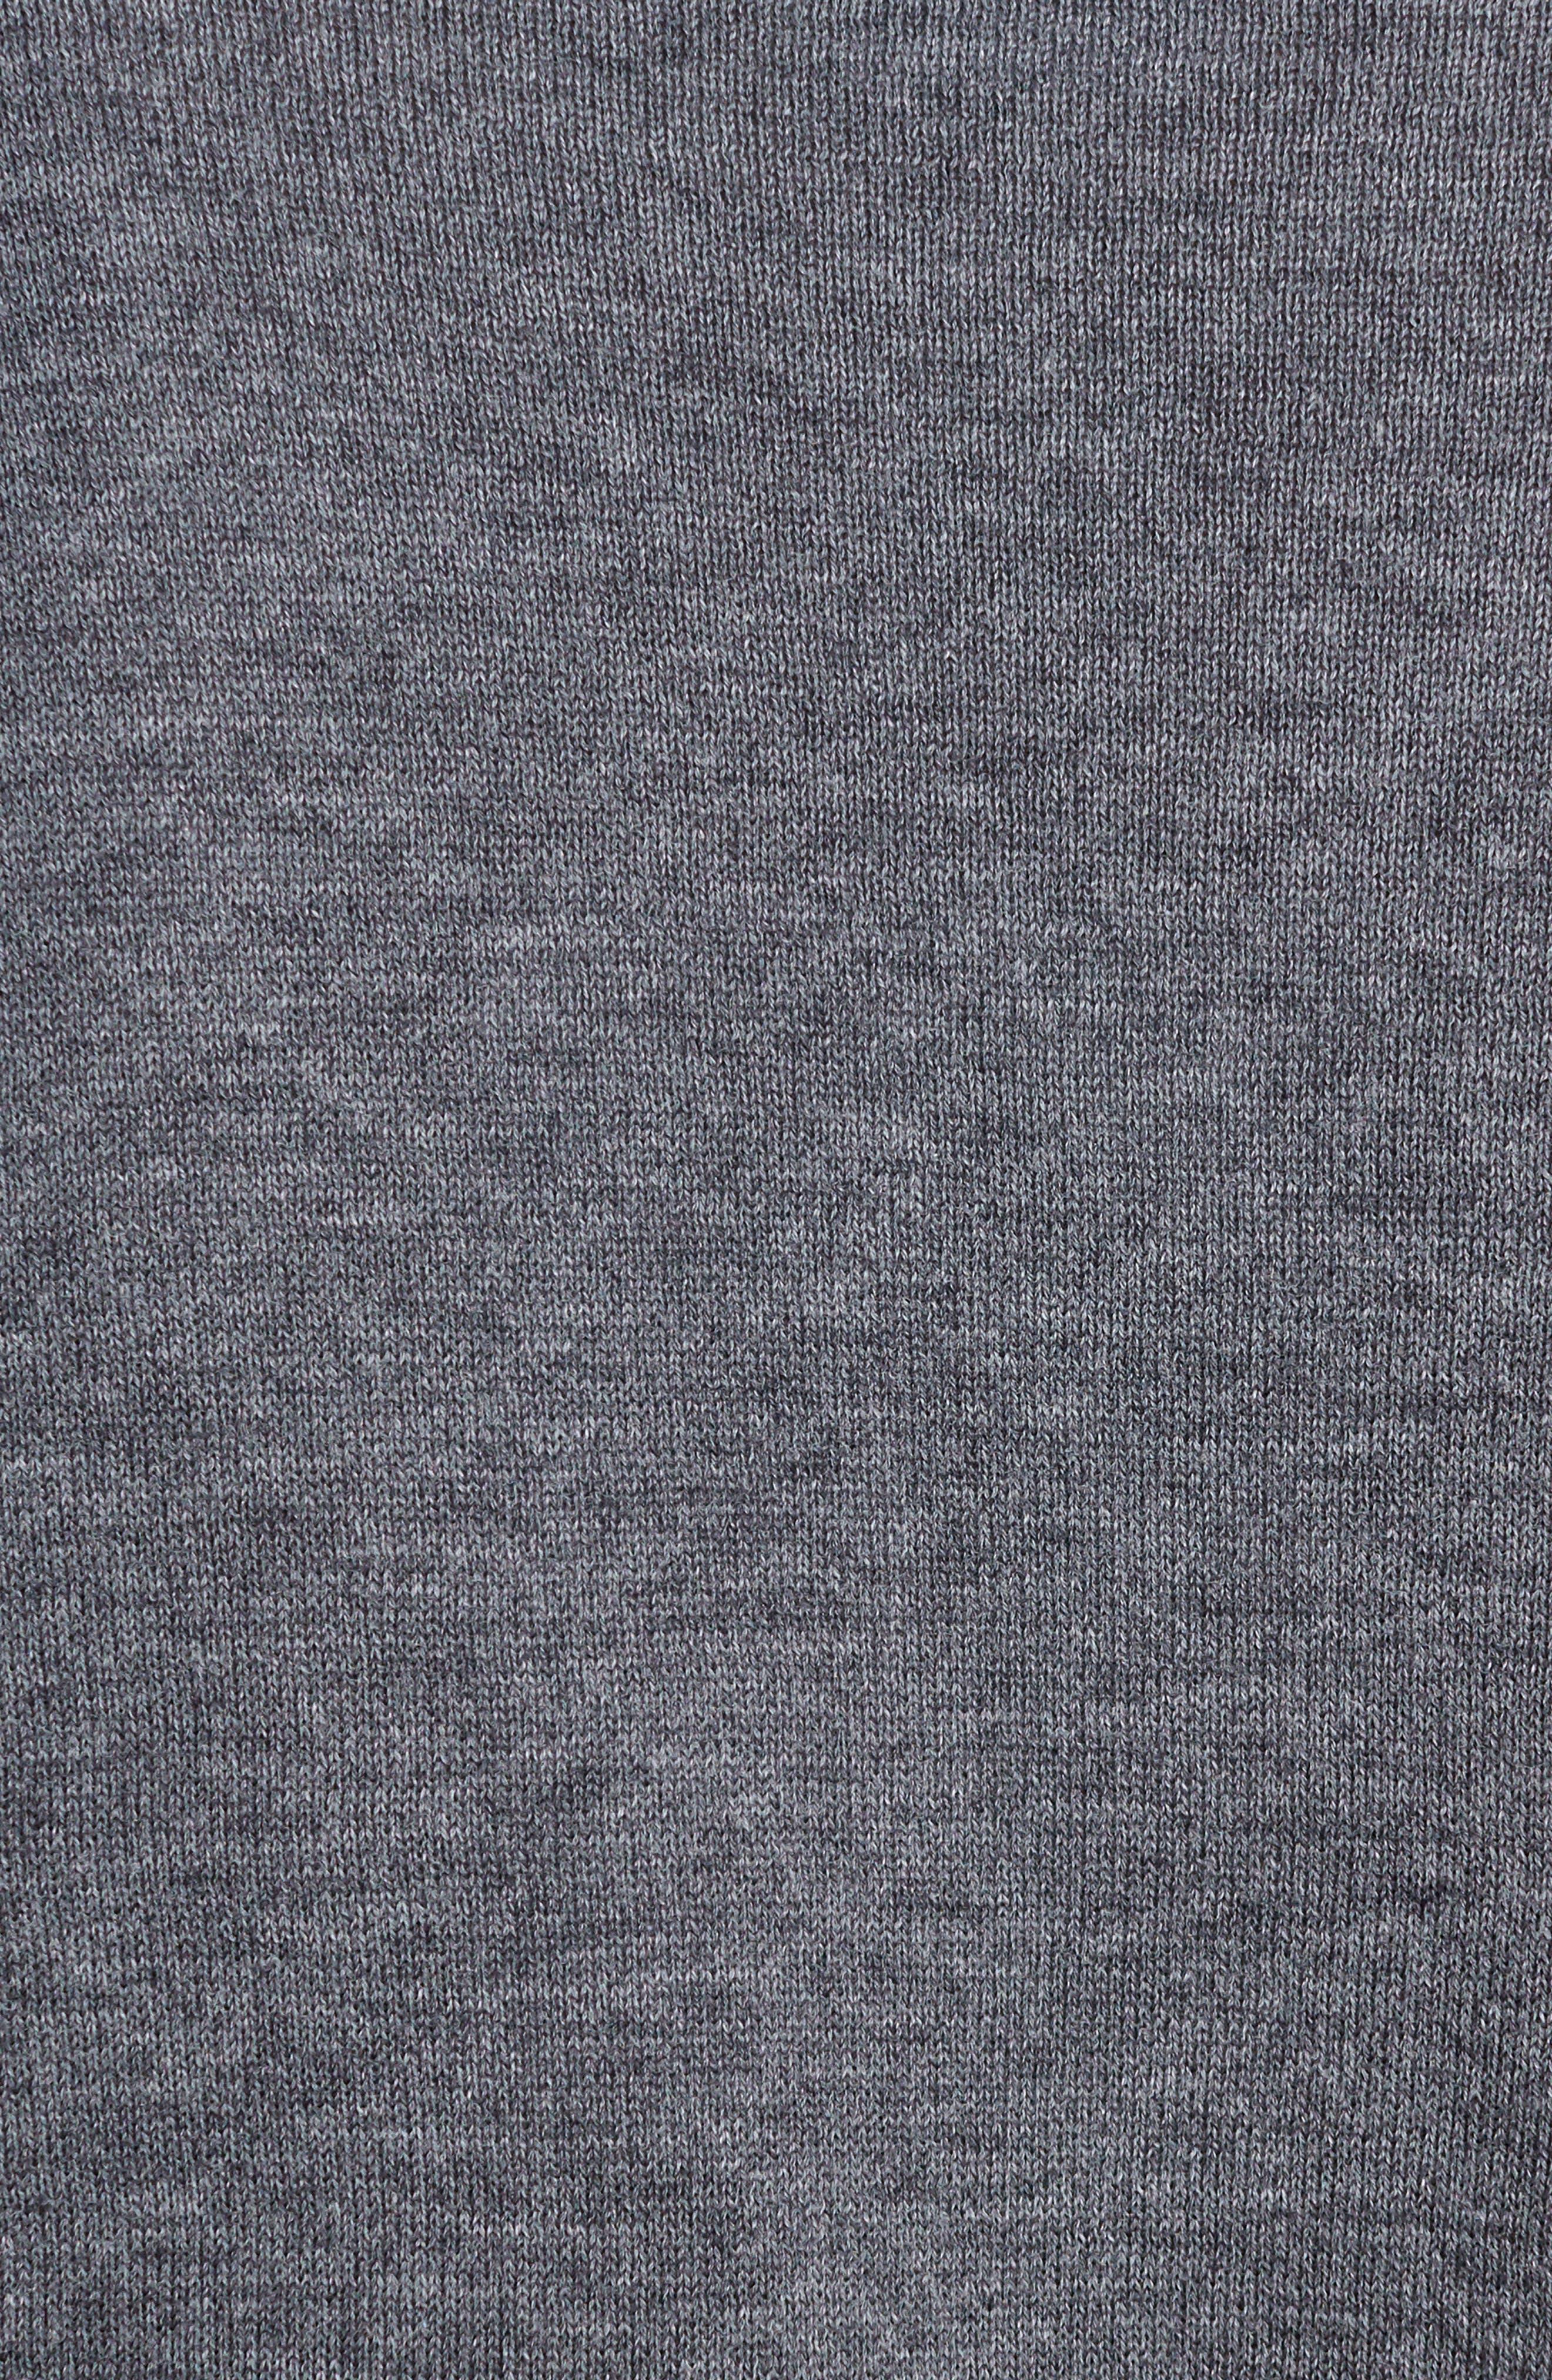 Alternate Image 5  - TOGA Check Tier Sleeve Sweater